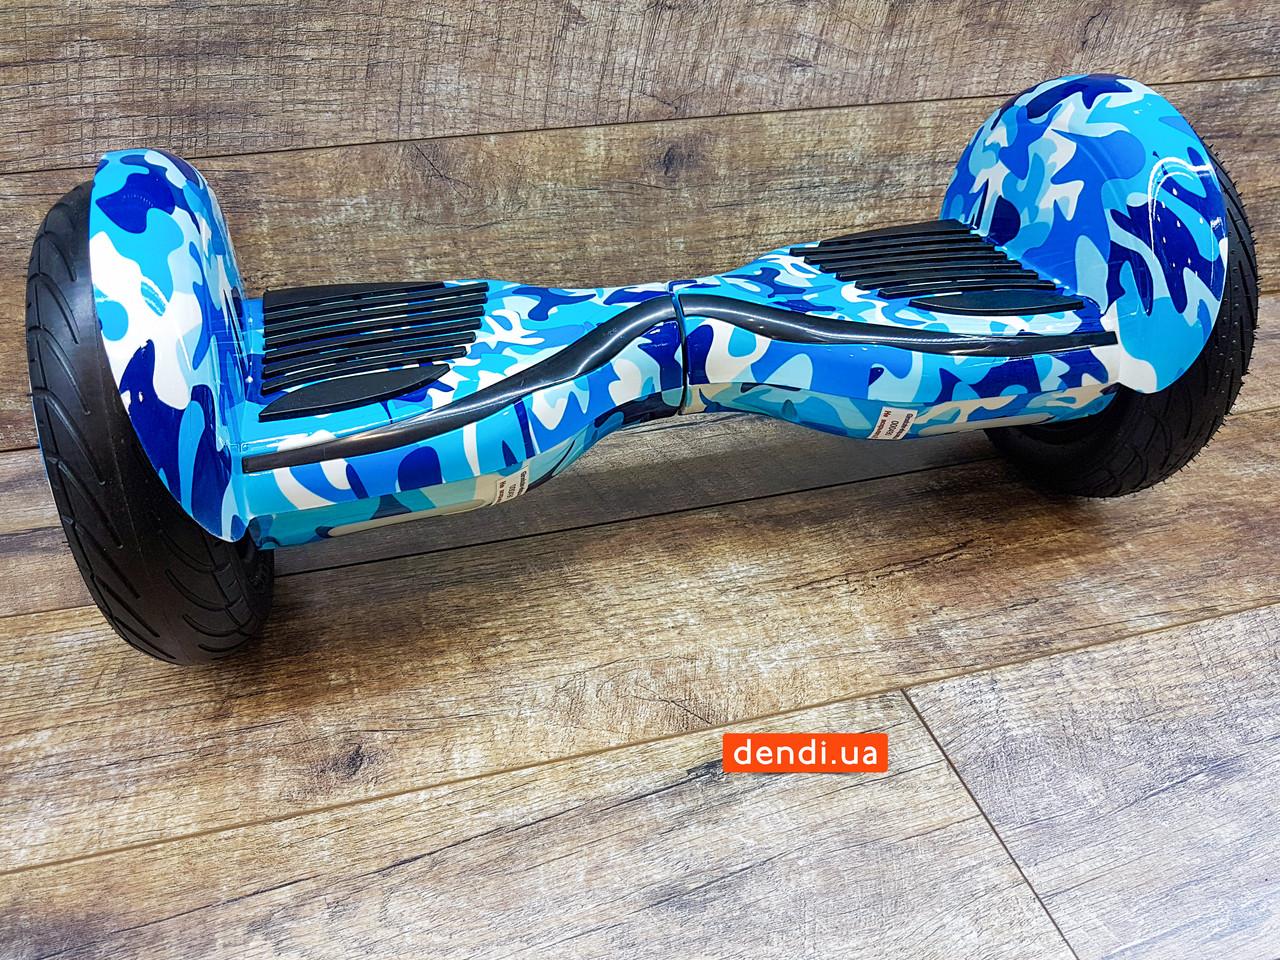 Гироборд SBW 10.5 Premium TaoTao Самобаланс Камуфляж Синий